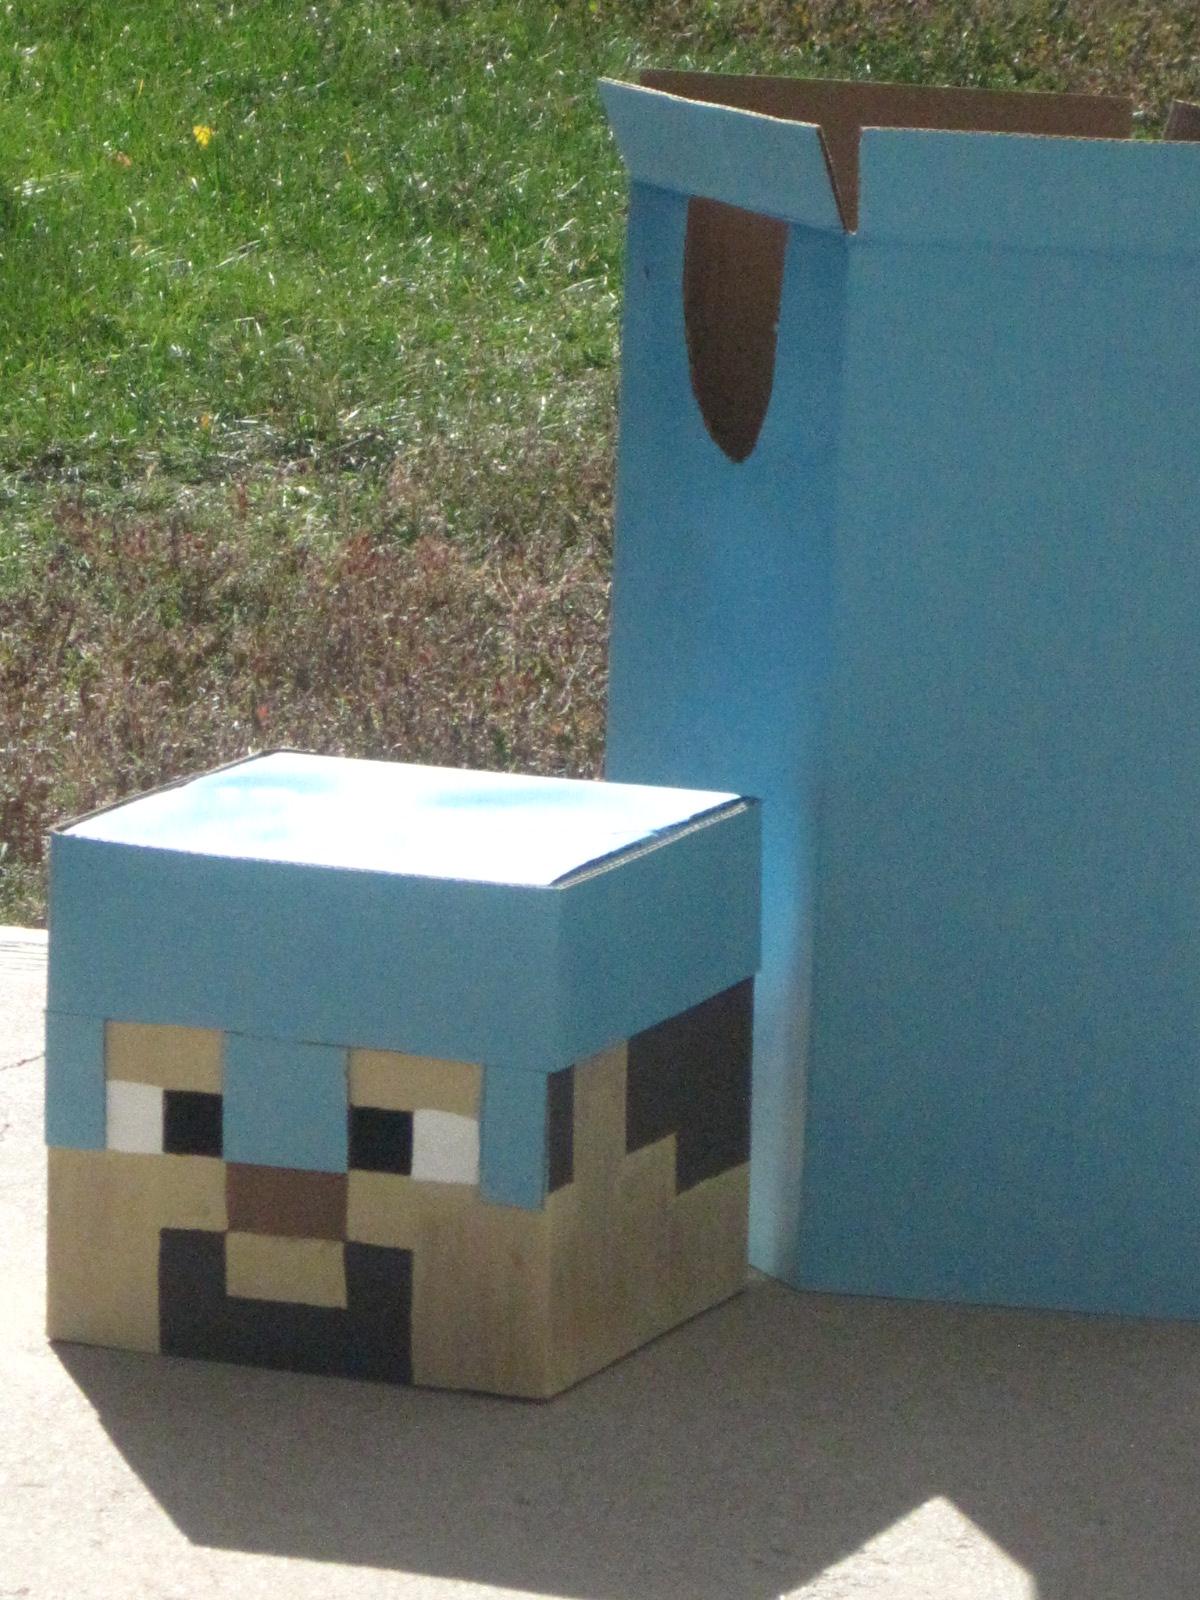 Little House In Colorado: Minecraft Halloween Costume